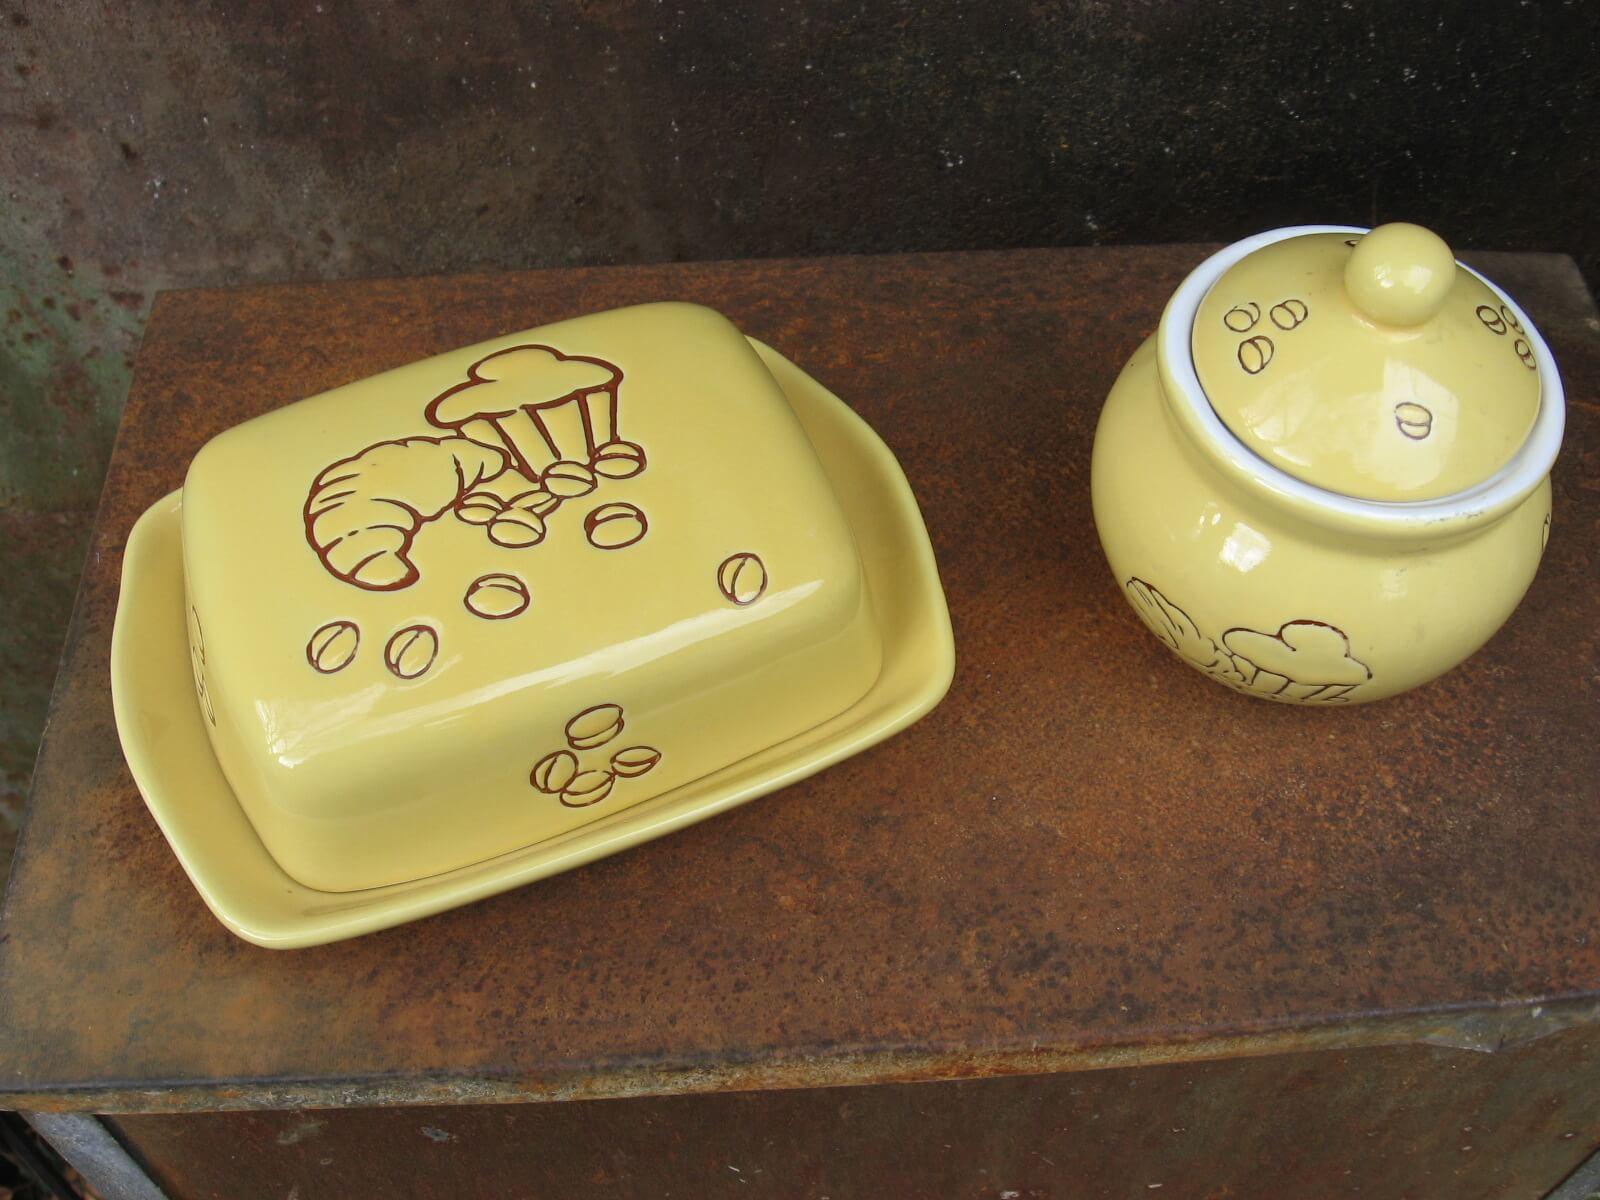 French croissant brioche butter dish jam pot ceramic pottery at PumpjackPiddlwick